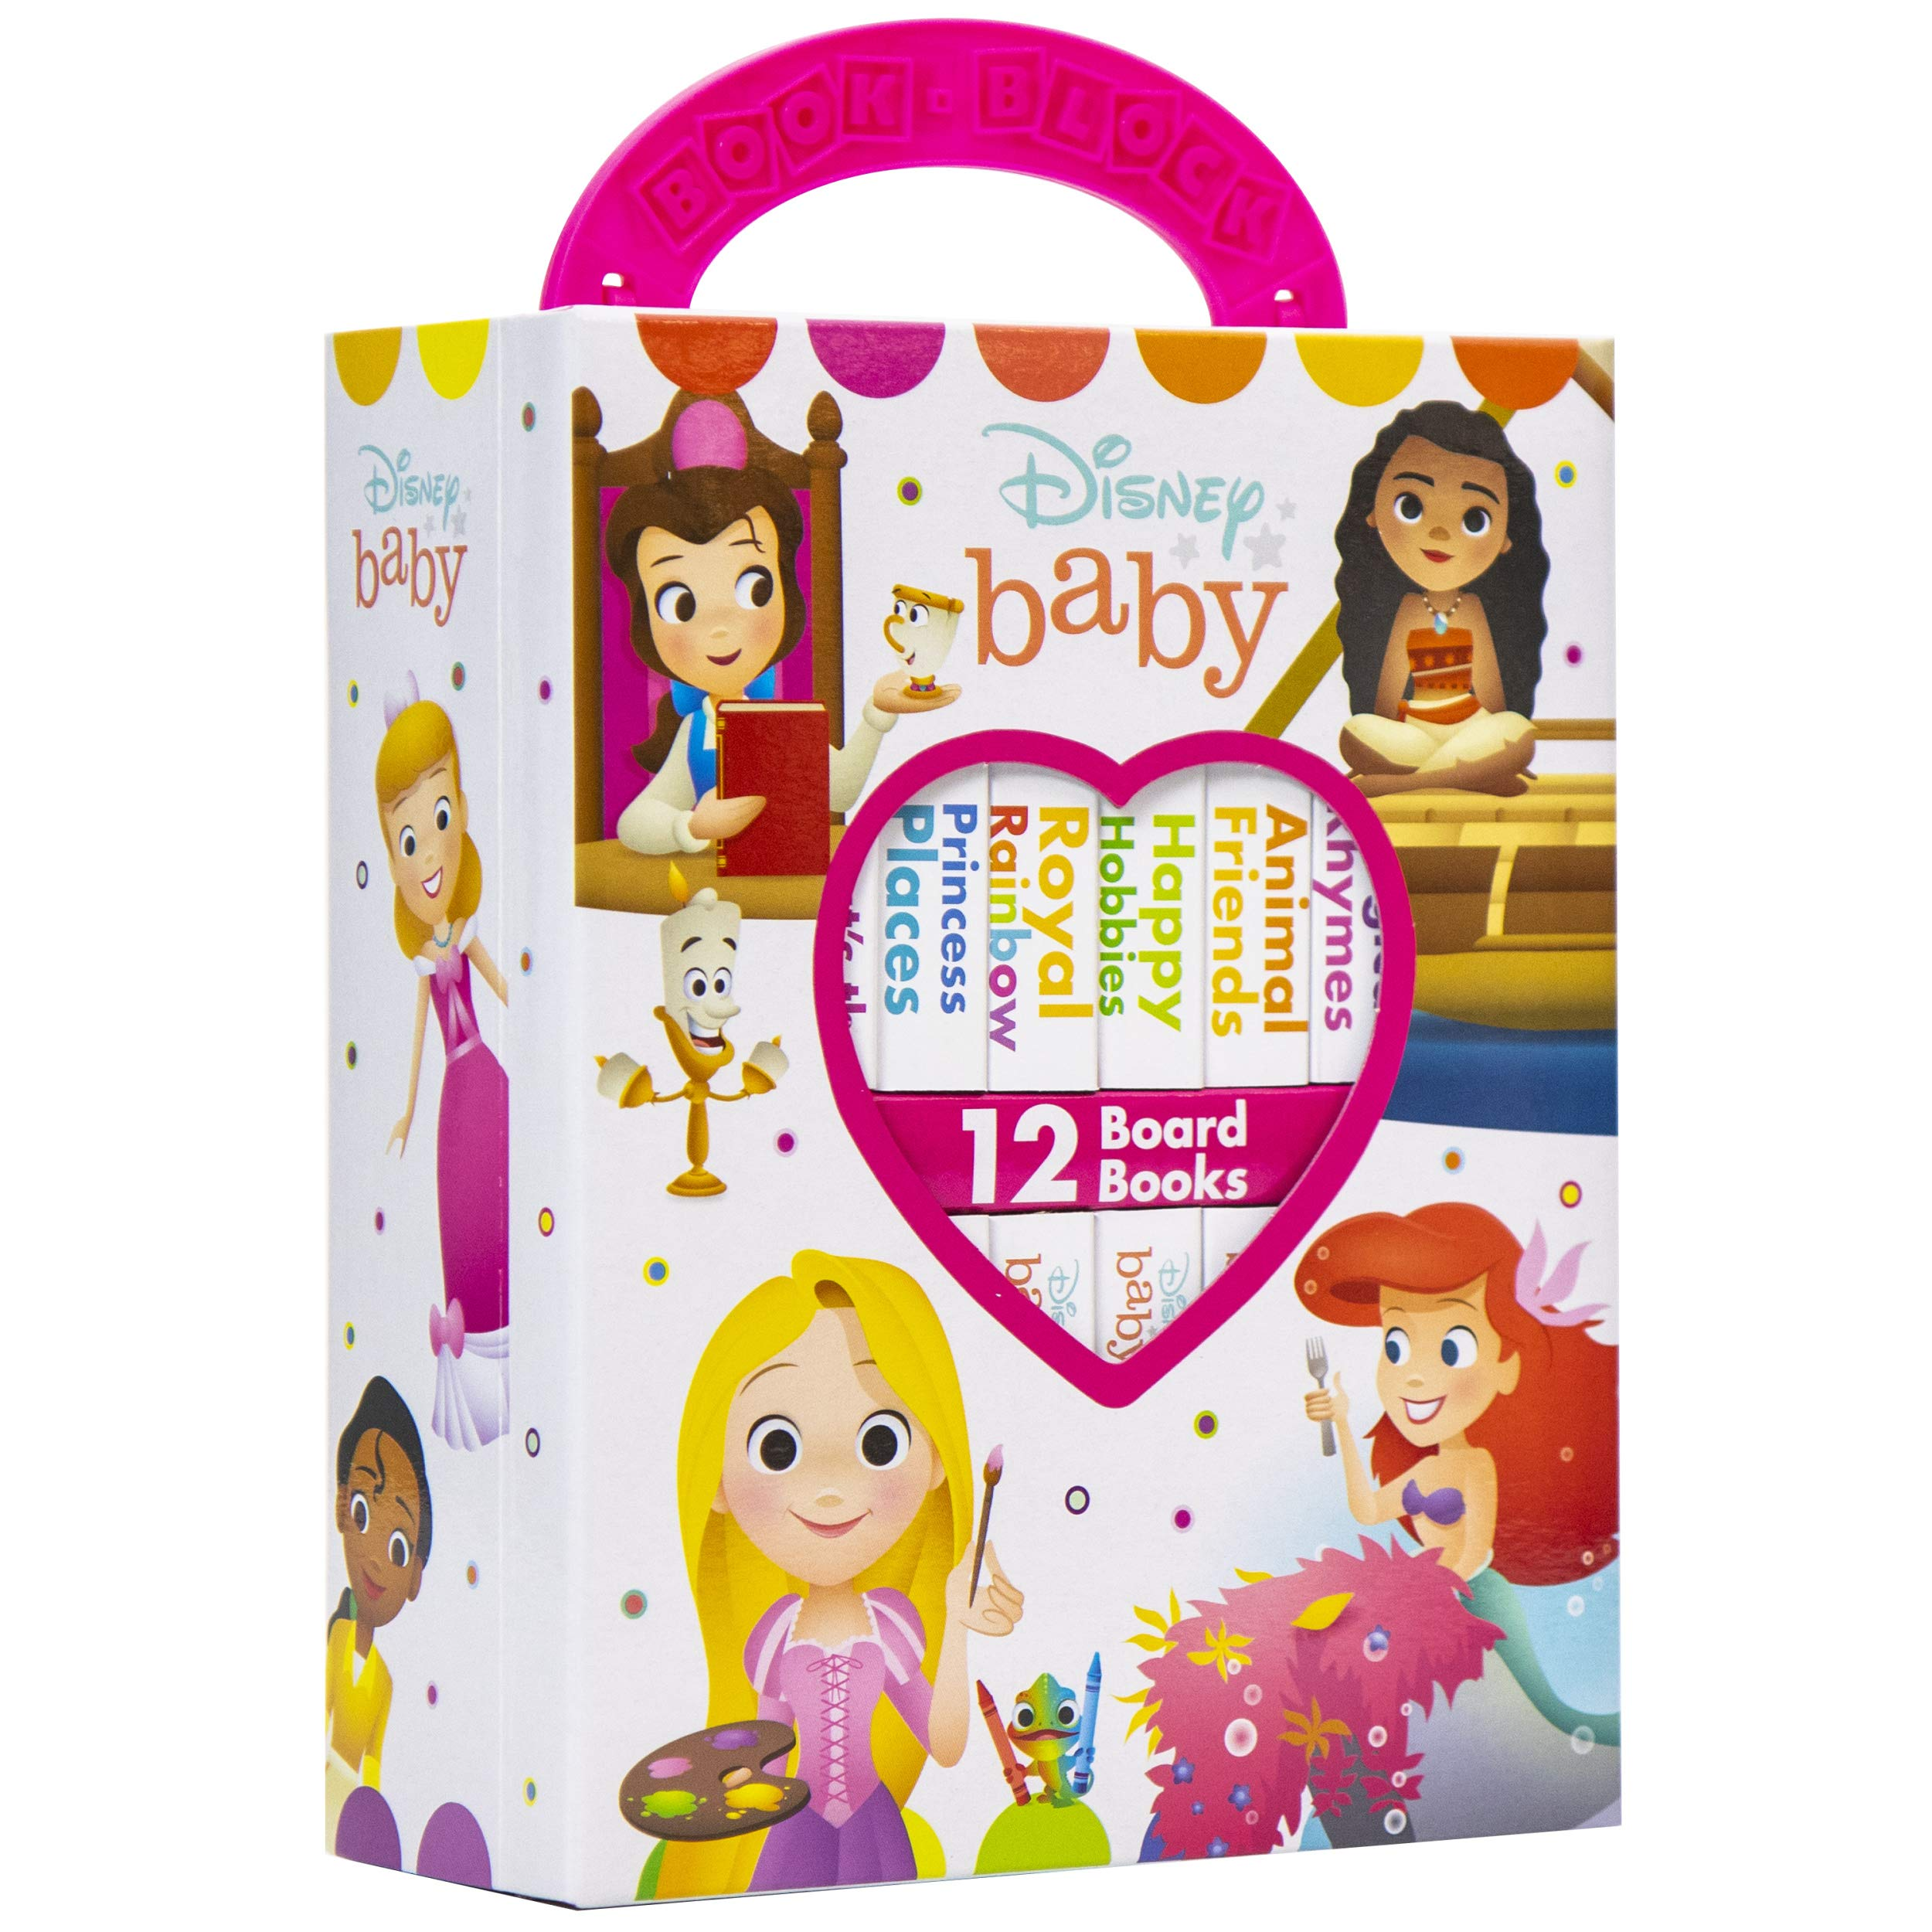 Disney Baby Princess - My First Library Board Book Block 12 Book Set